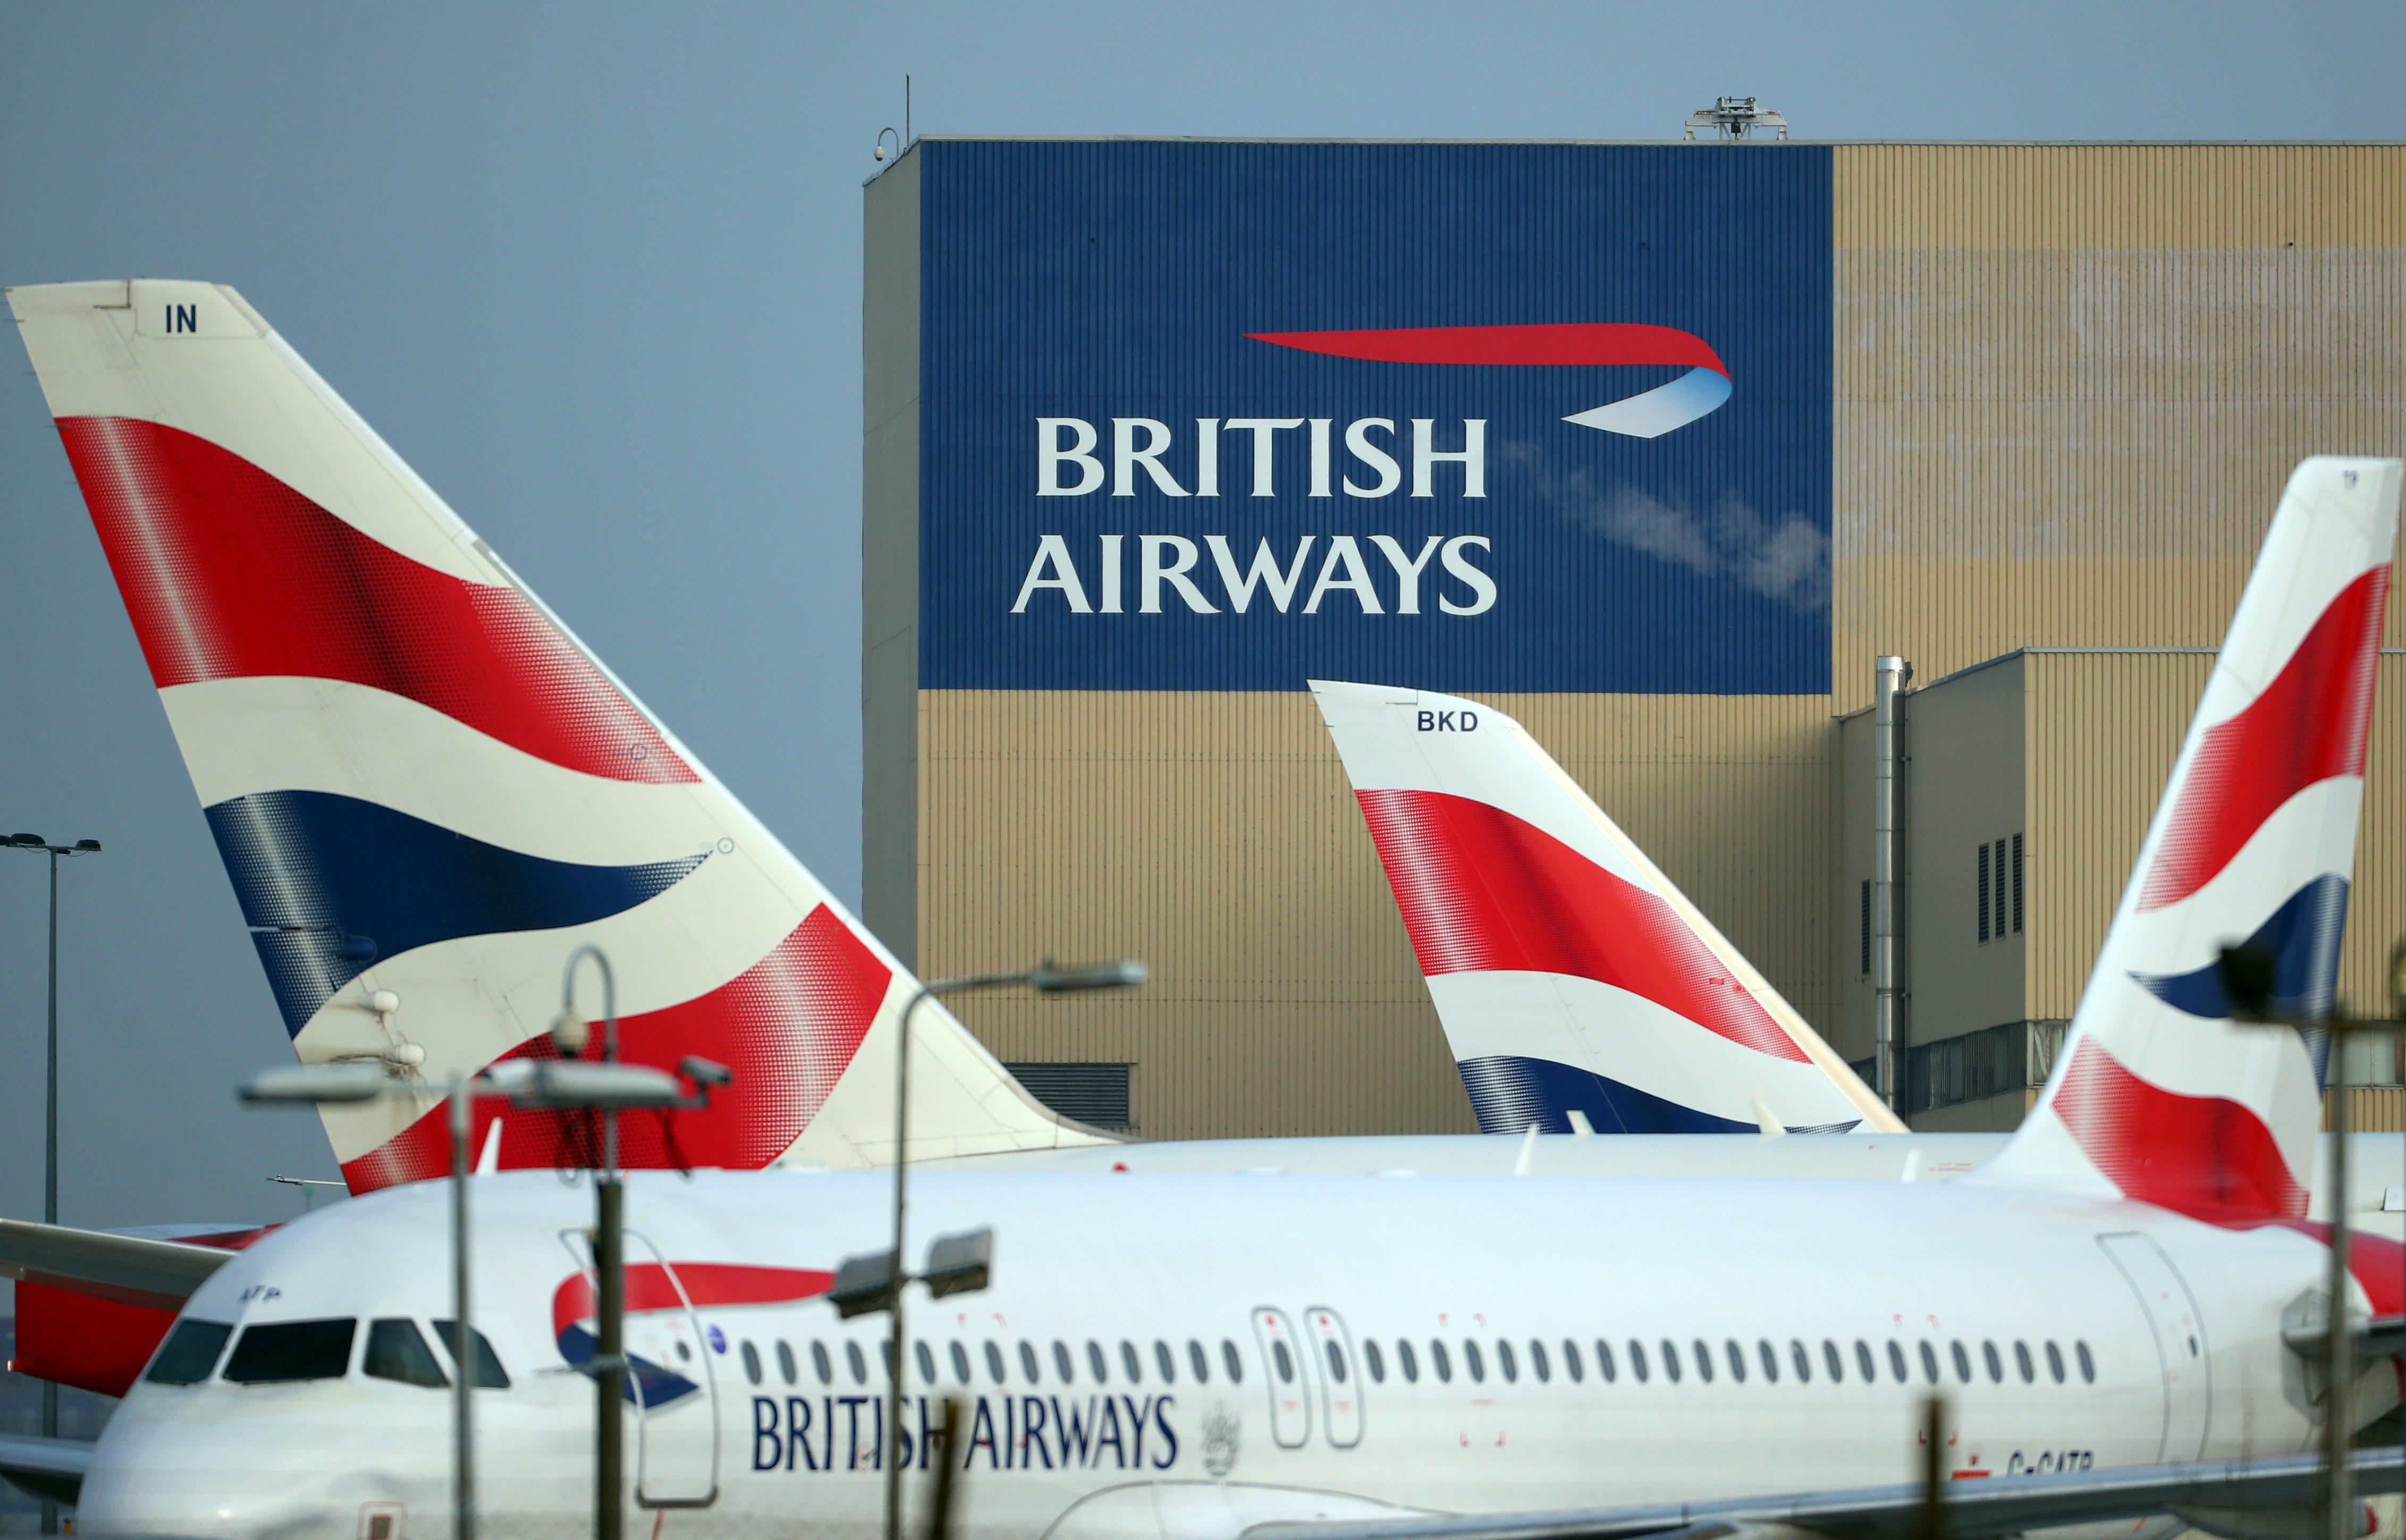 British Airways Website And Mobile App